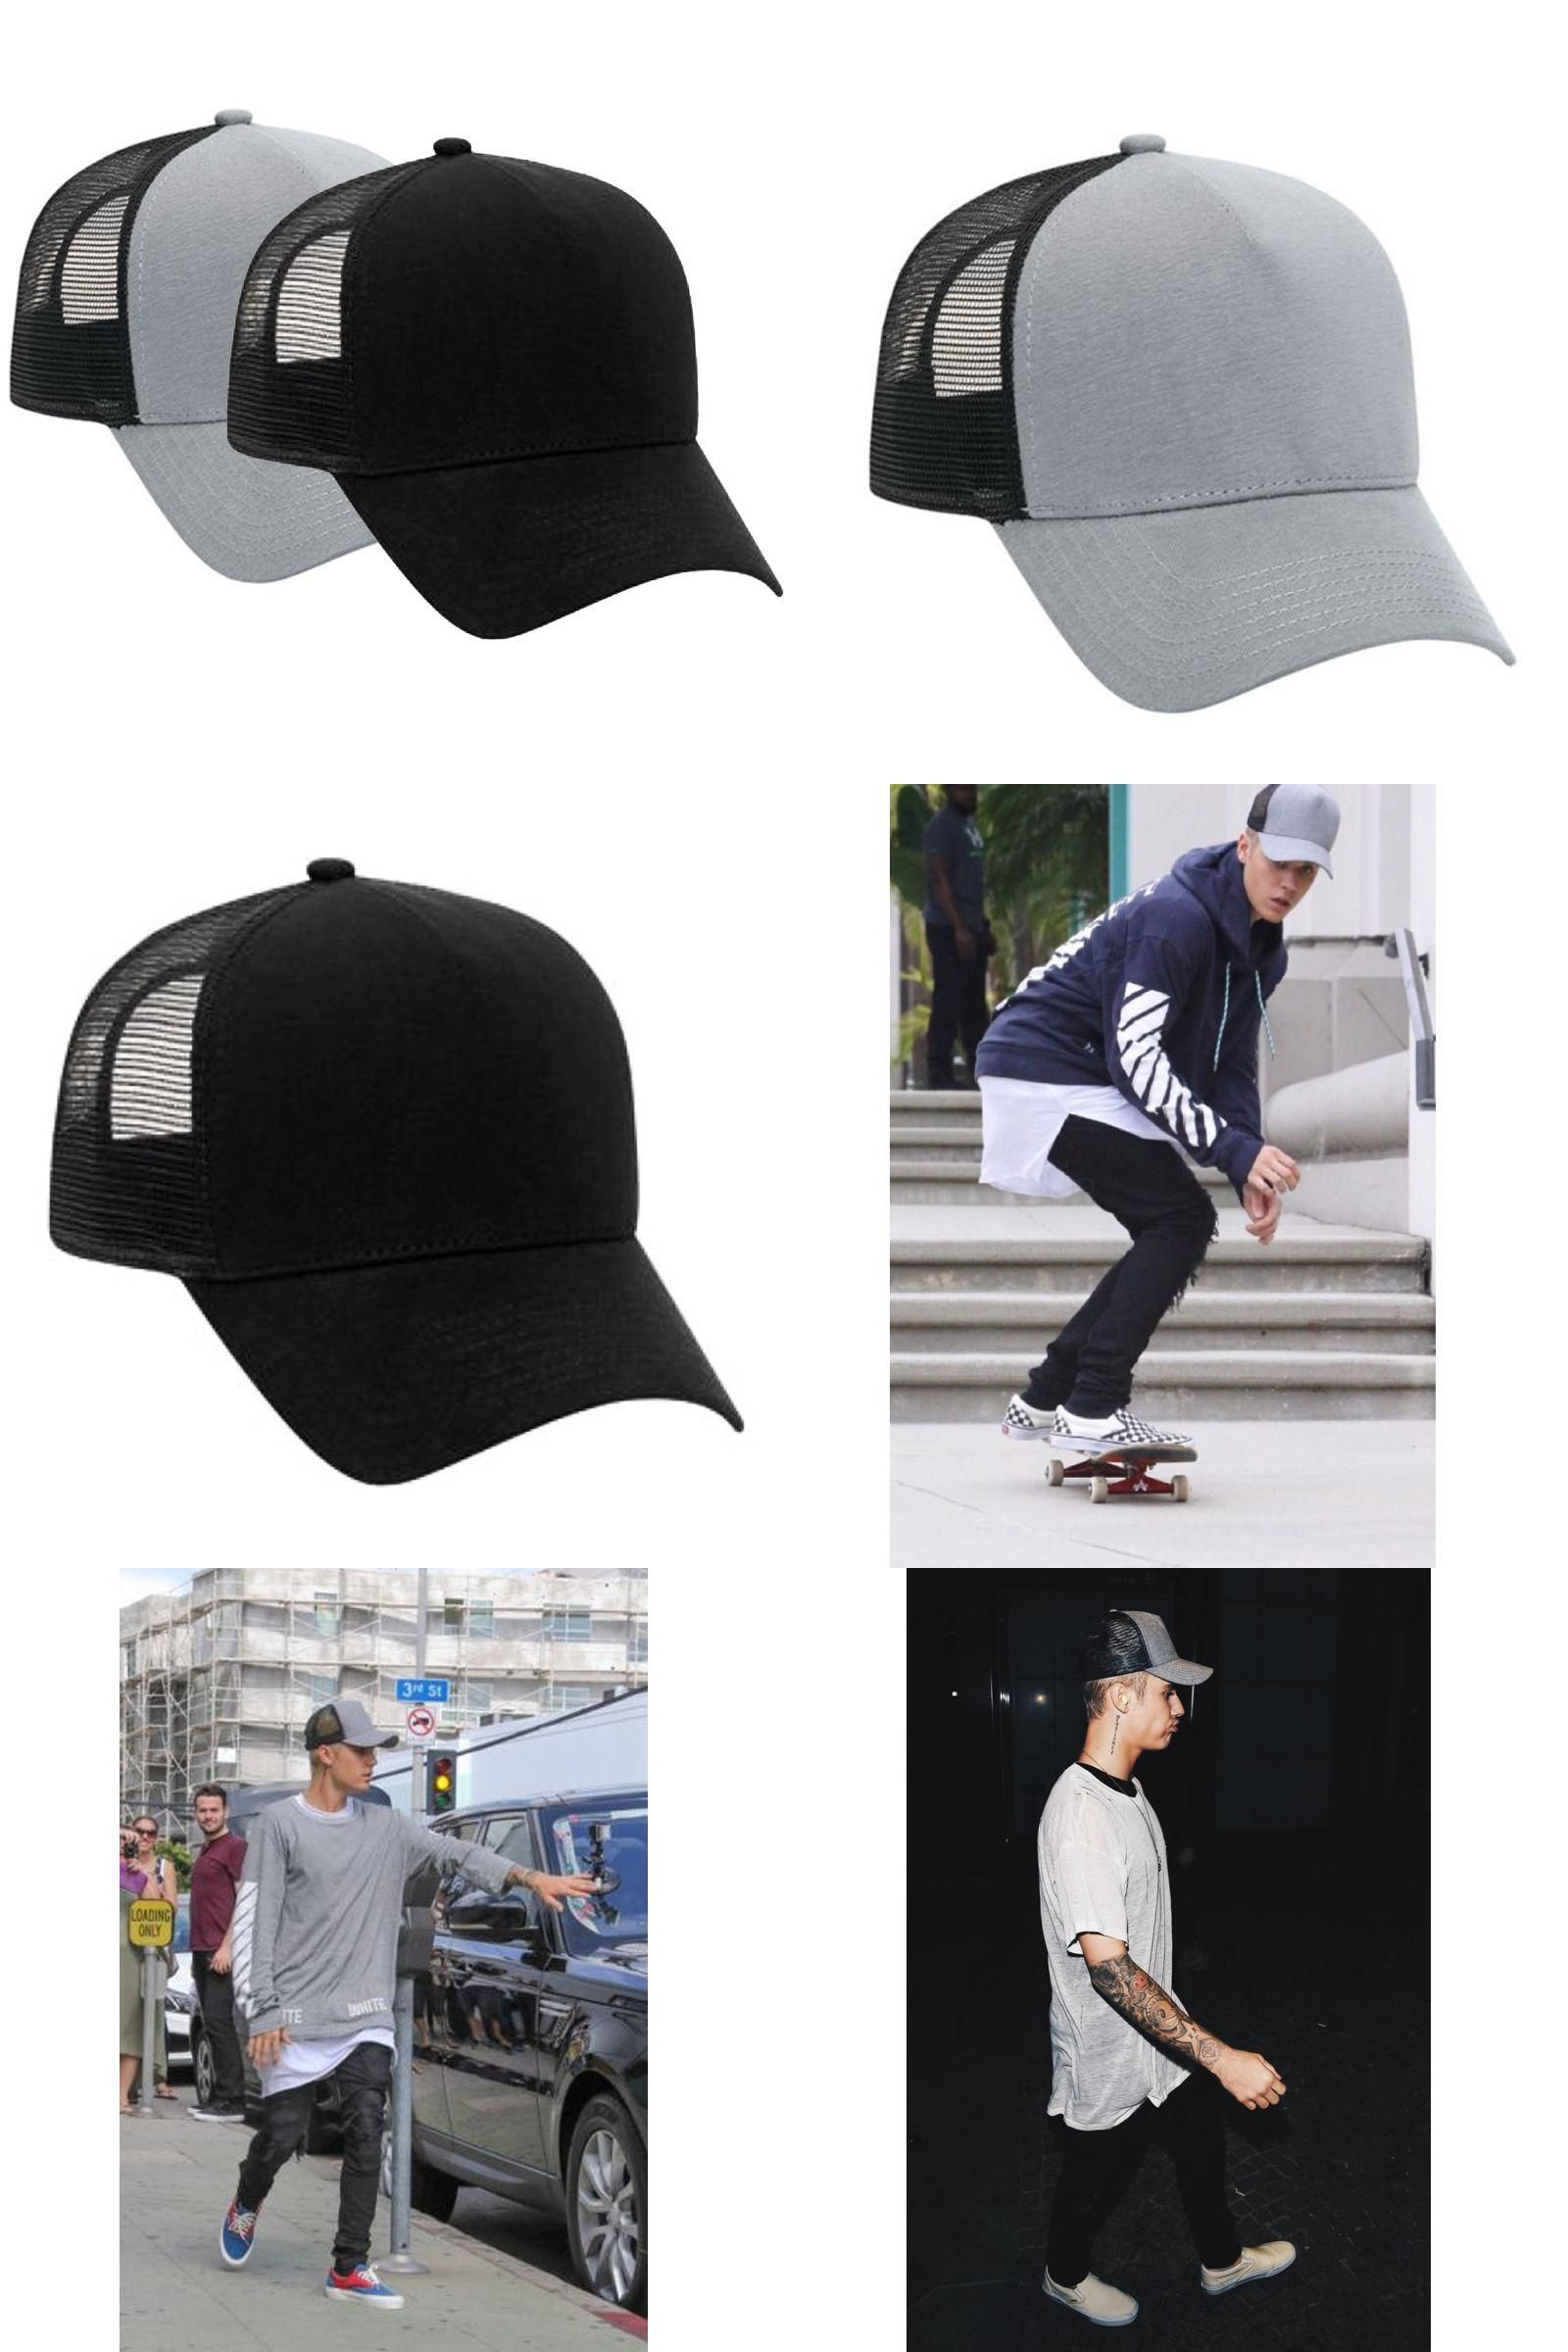 0e6f6bda47e [Visit to Buy] JUSTIN BIEBER TRUCKER HAT Perse Alternative BLACK GREY  similar look flannel GRAY Casual Mesh Baseball Caps #Advertisement